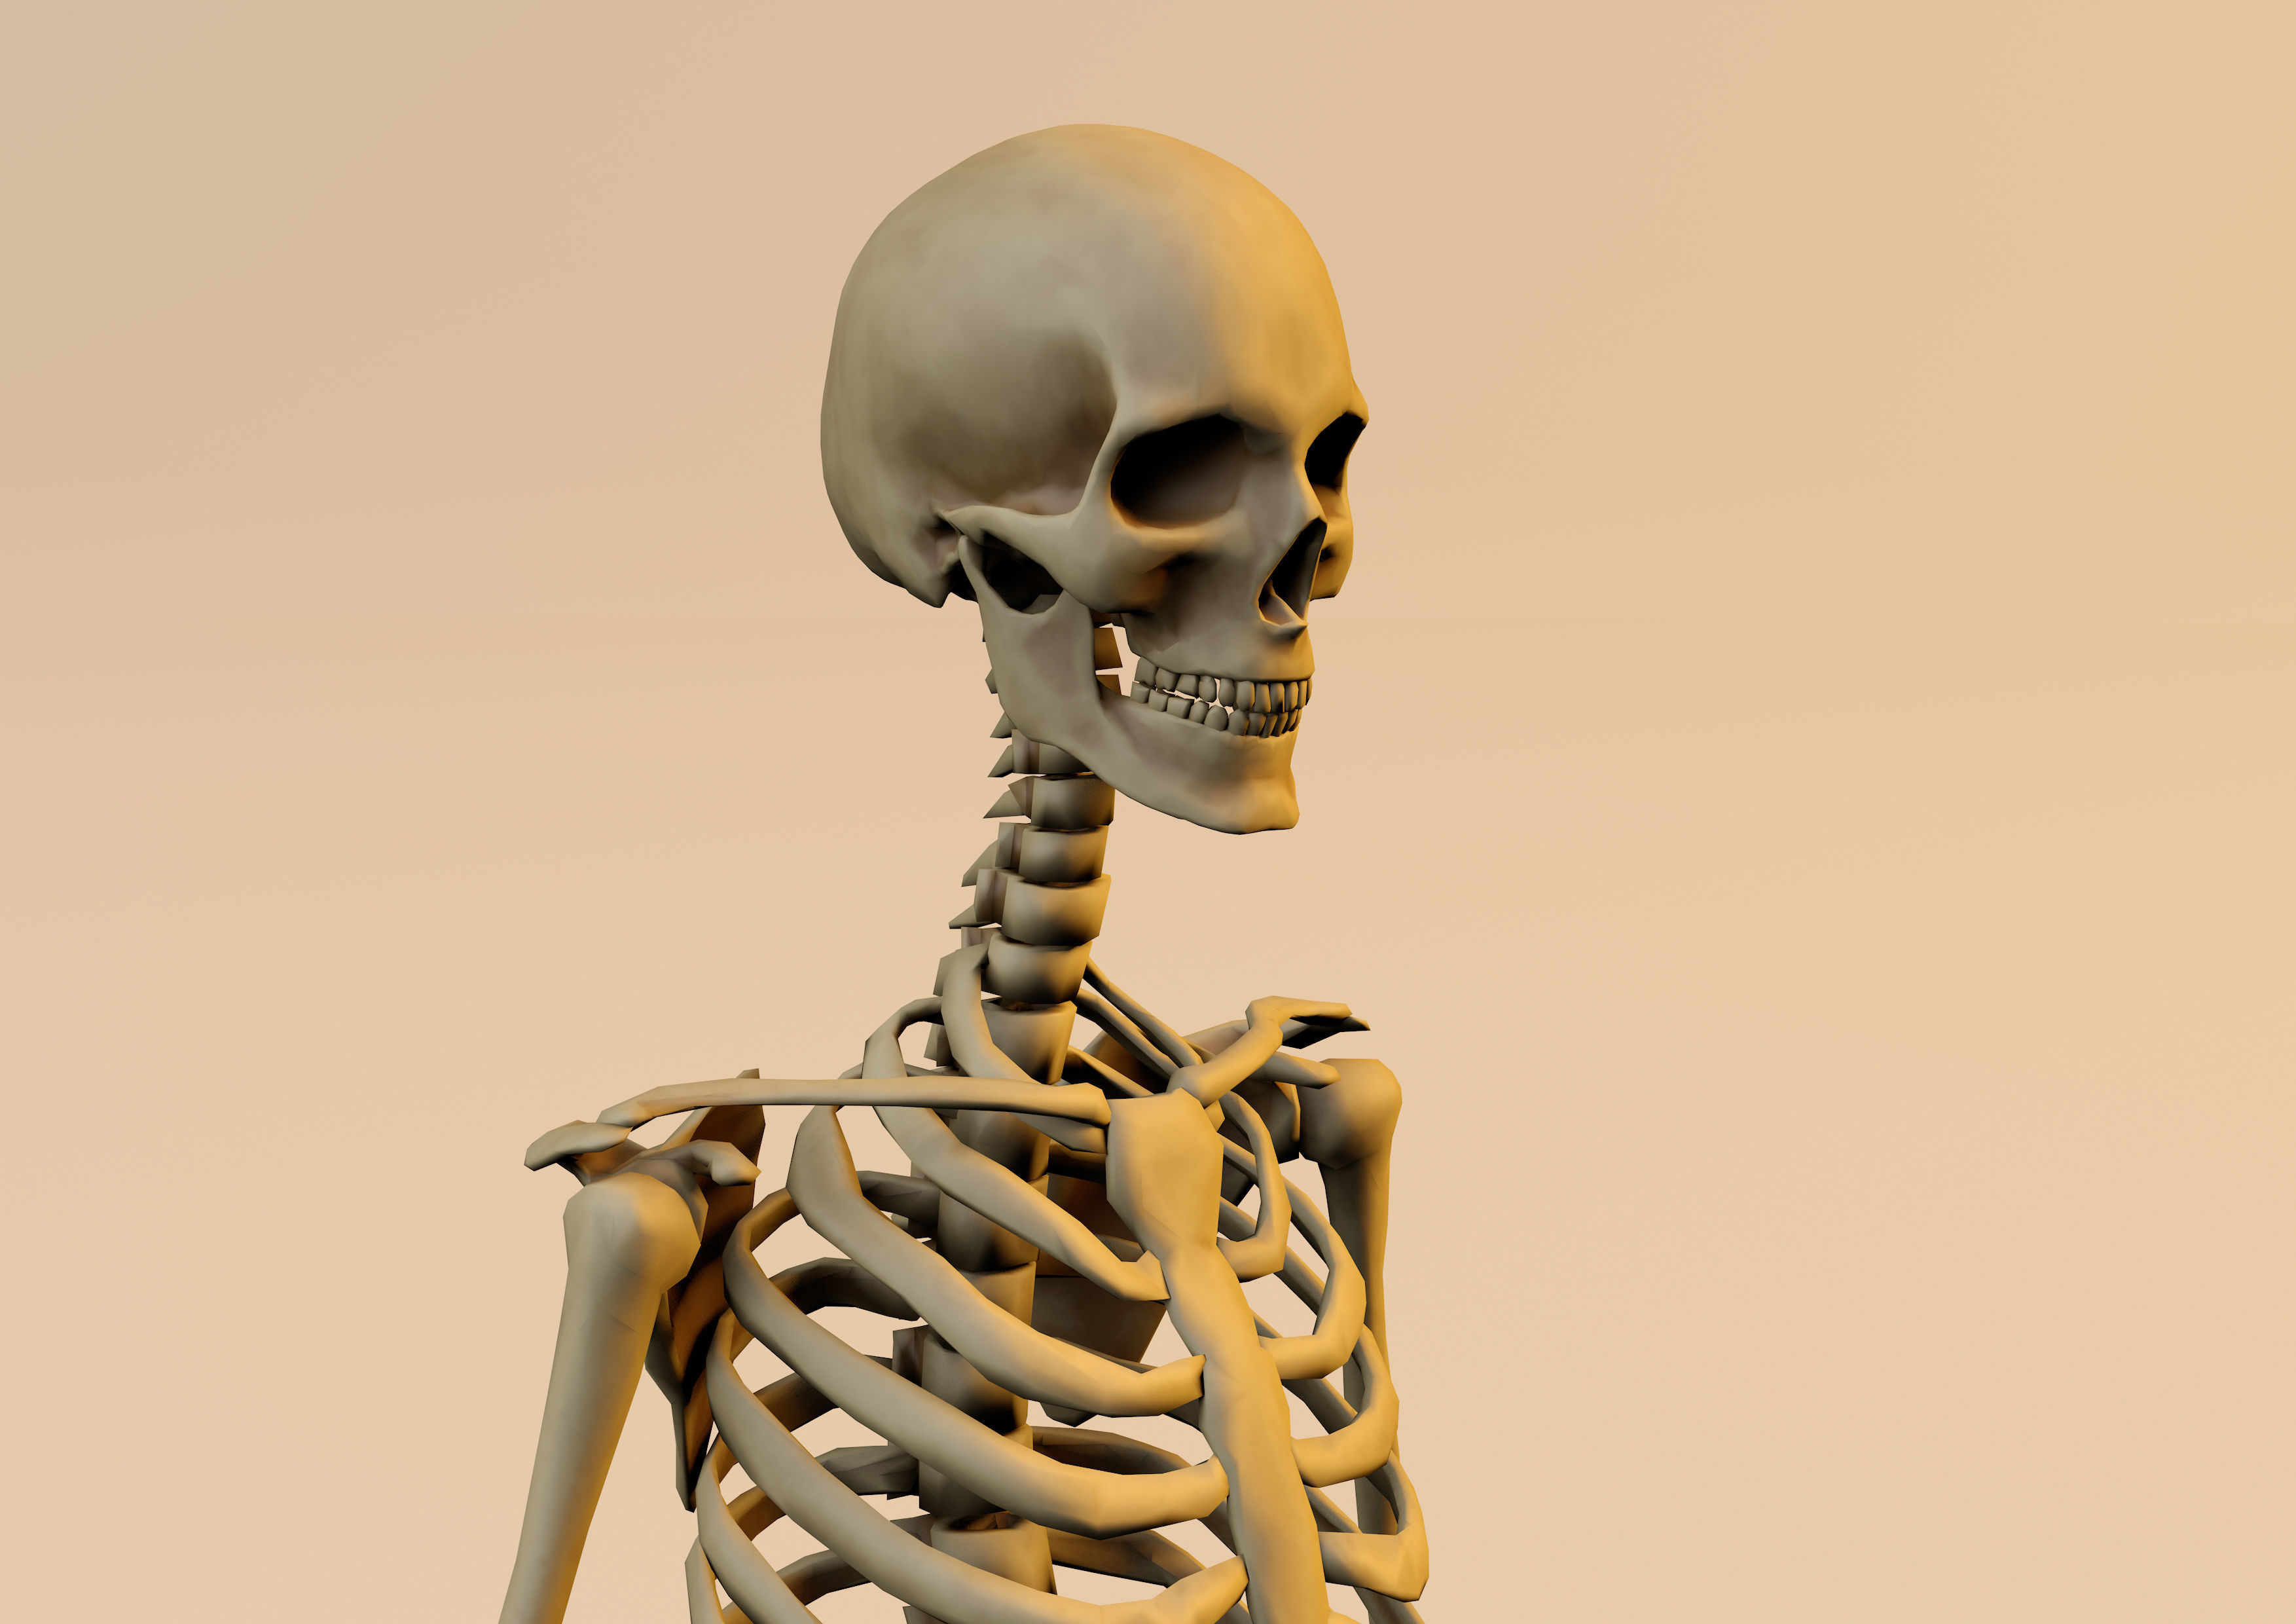 Anatomy skeleton model textured in substance painter